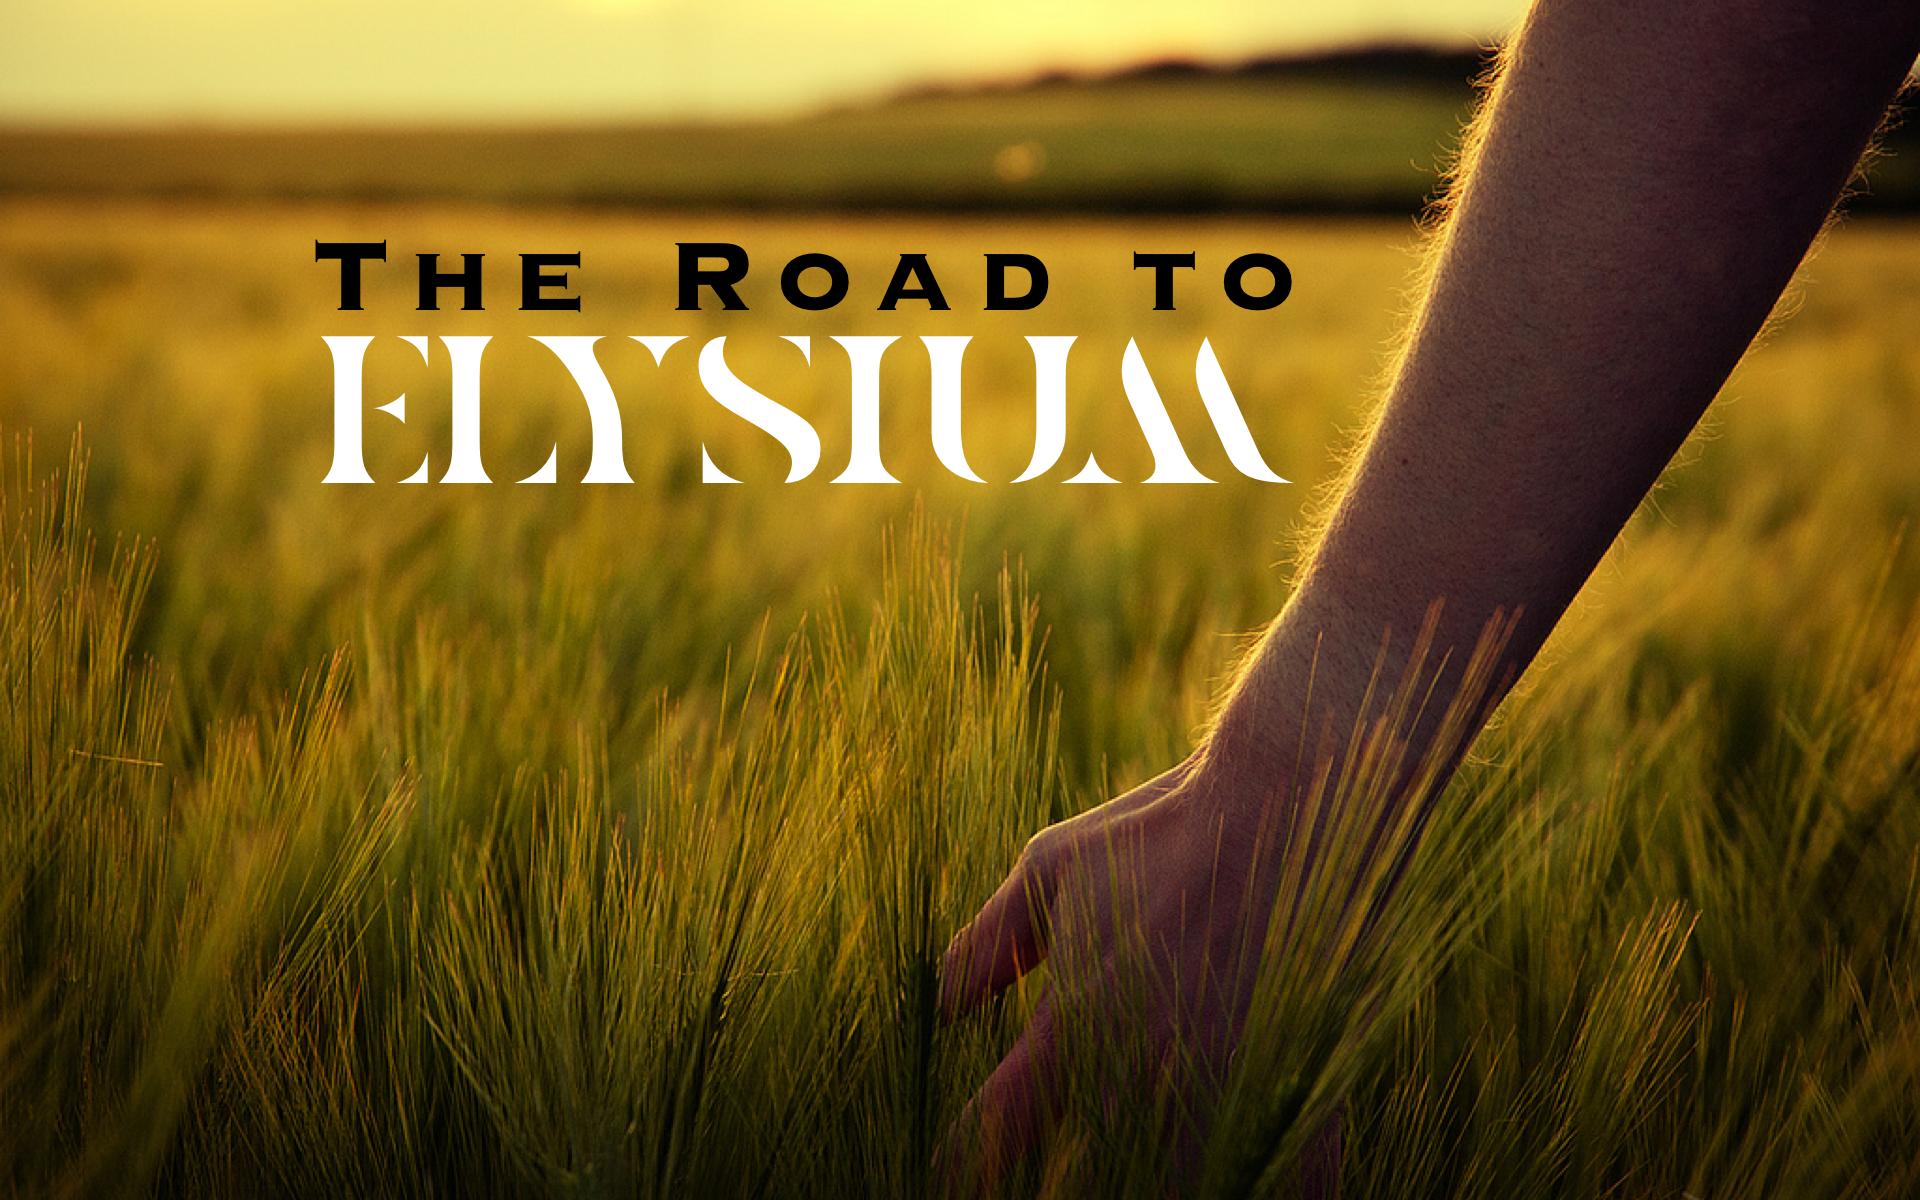 The Road to Elysium  (Grade 3.5)